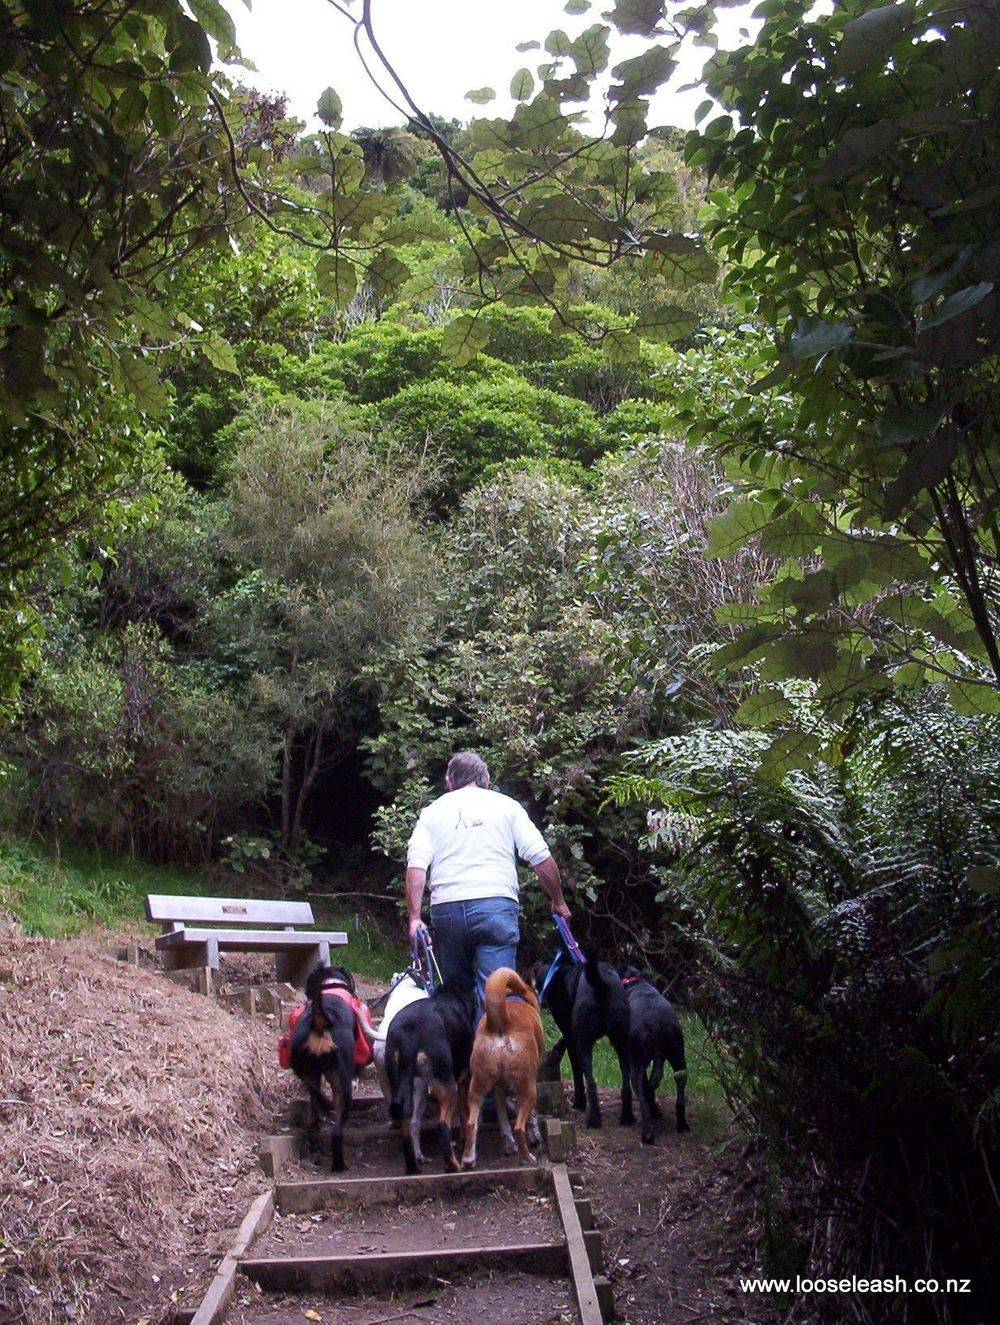 Johnsonville Dog Walker and dogs walking up the steps at Khandallah Park